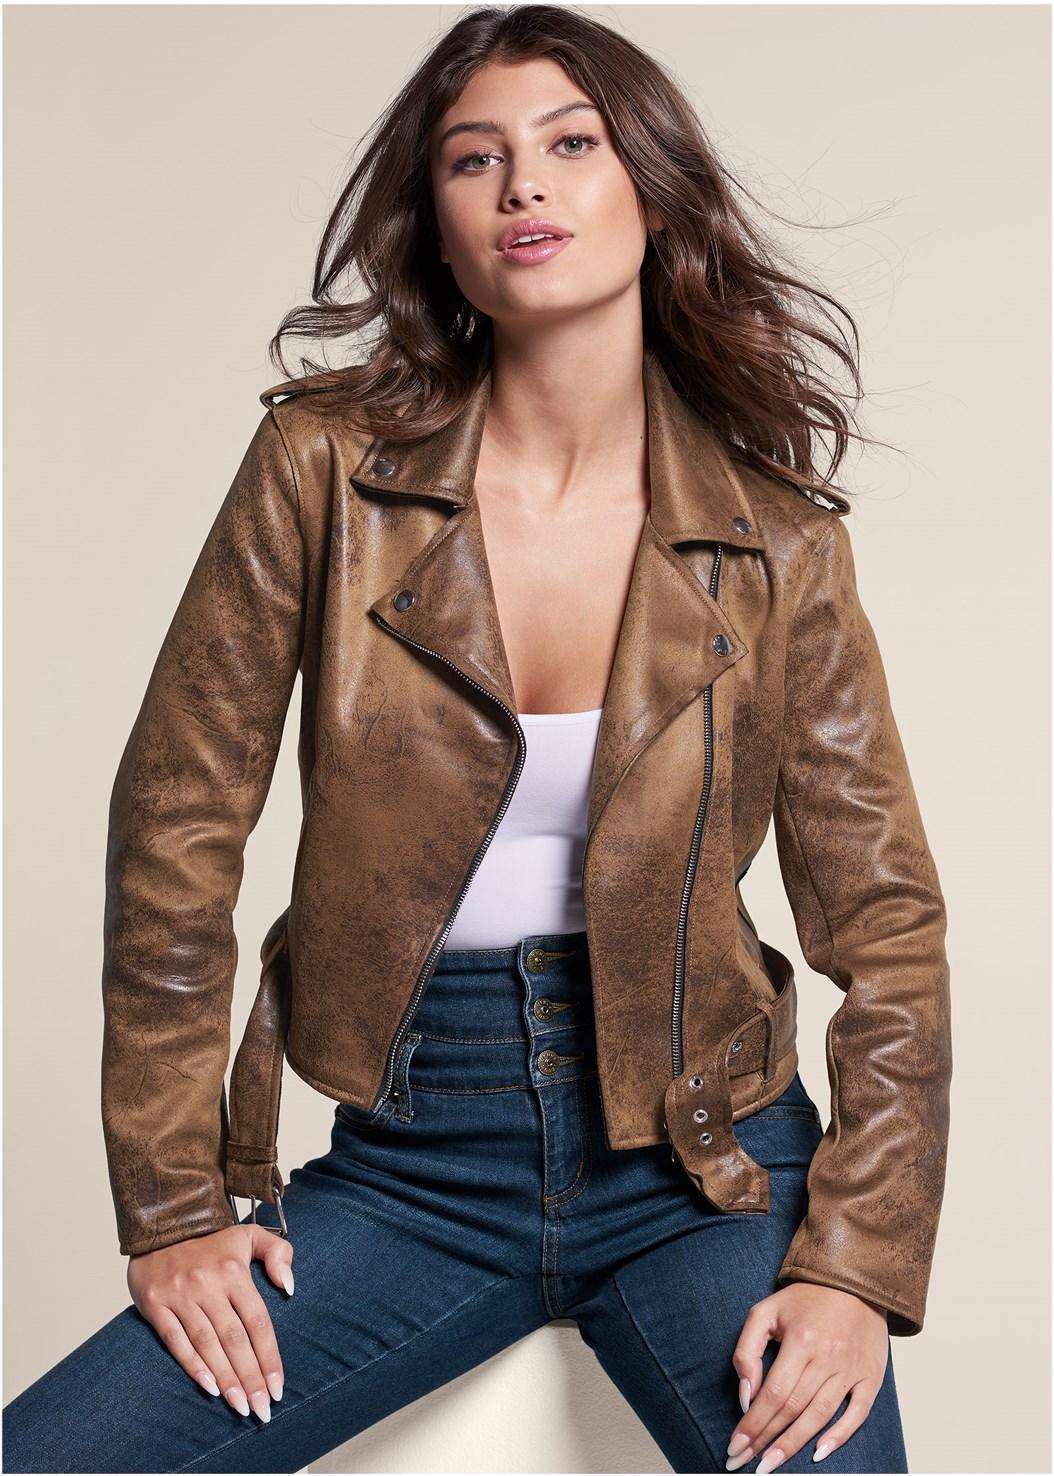 Distressed Moto Jacket,Seamless Cami,High Waisted Skinny Jeans